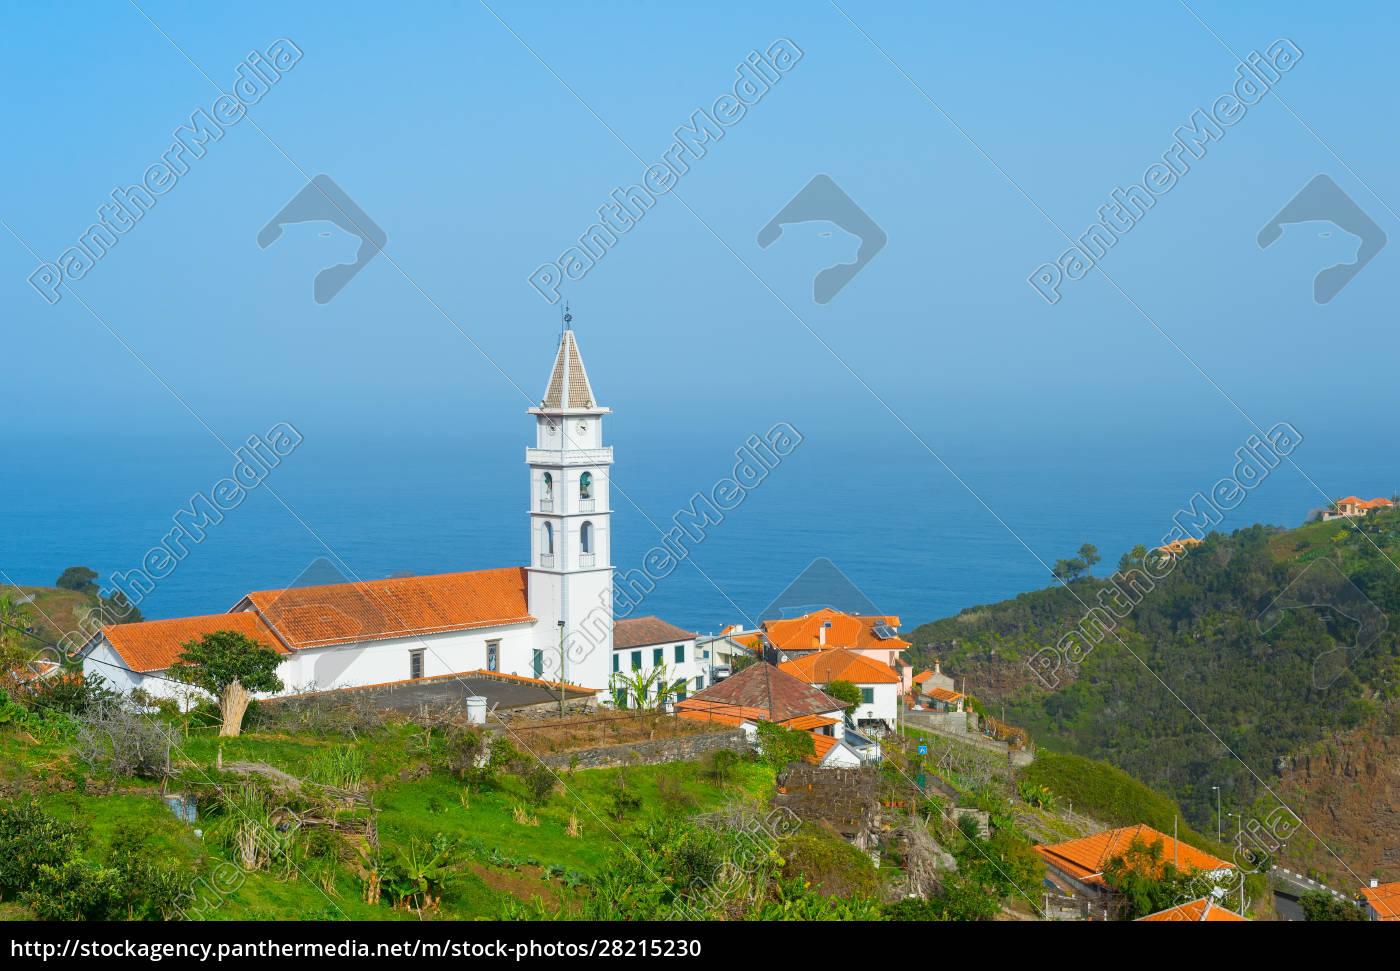 landscape, village, church, ocean, madeira - 28215230